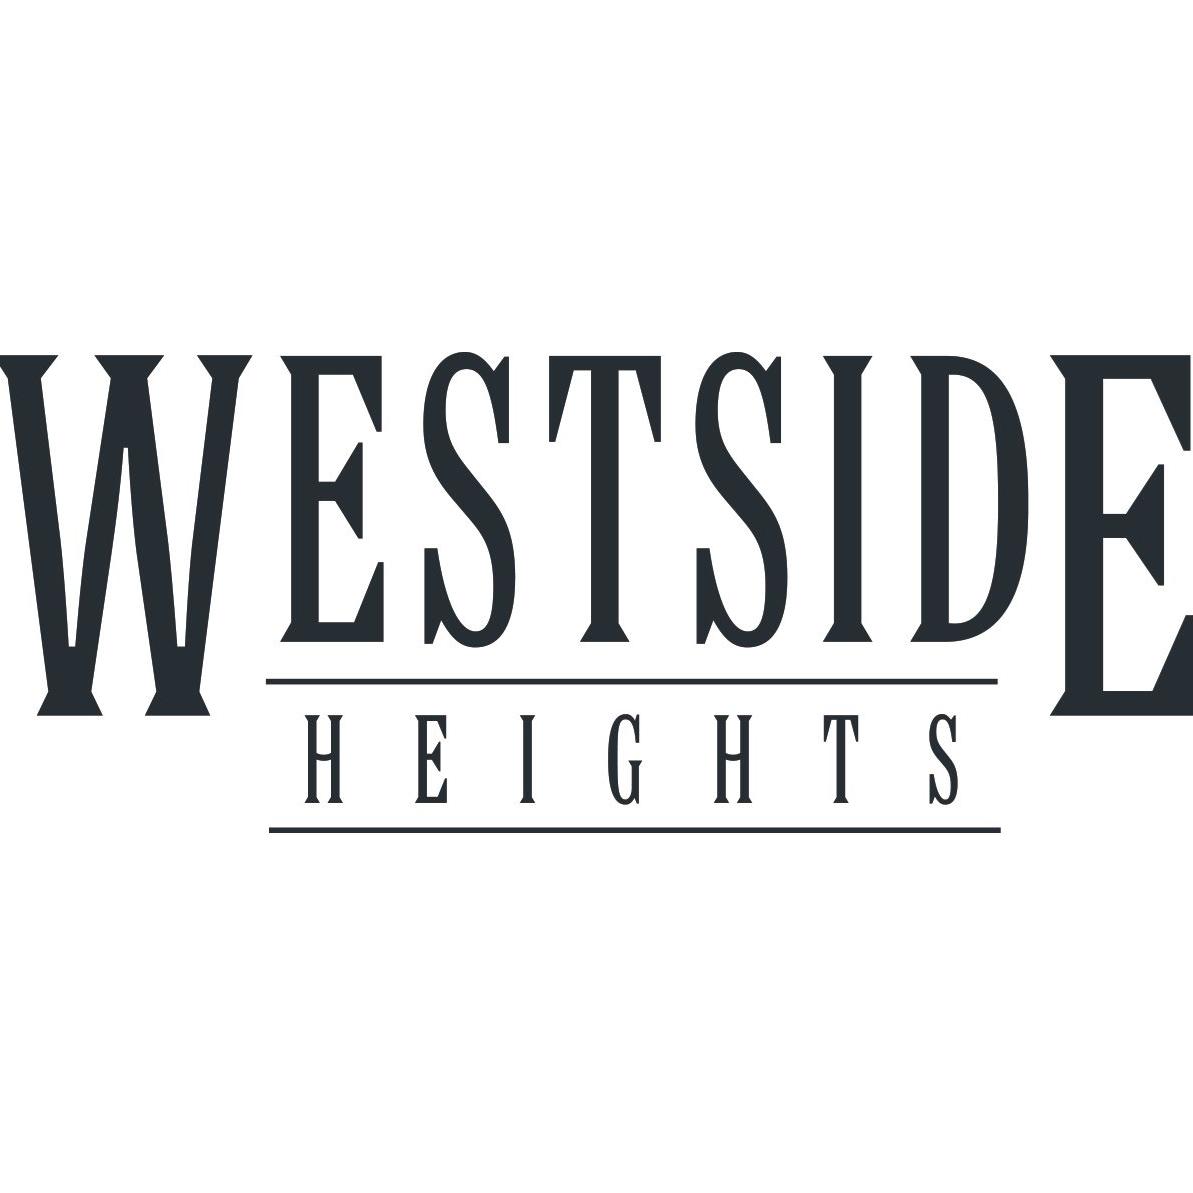 Westside Heights image 4